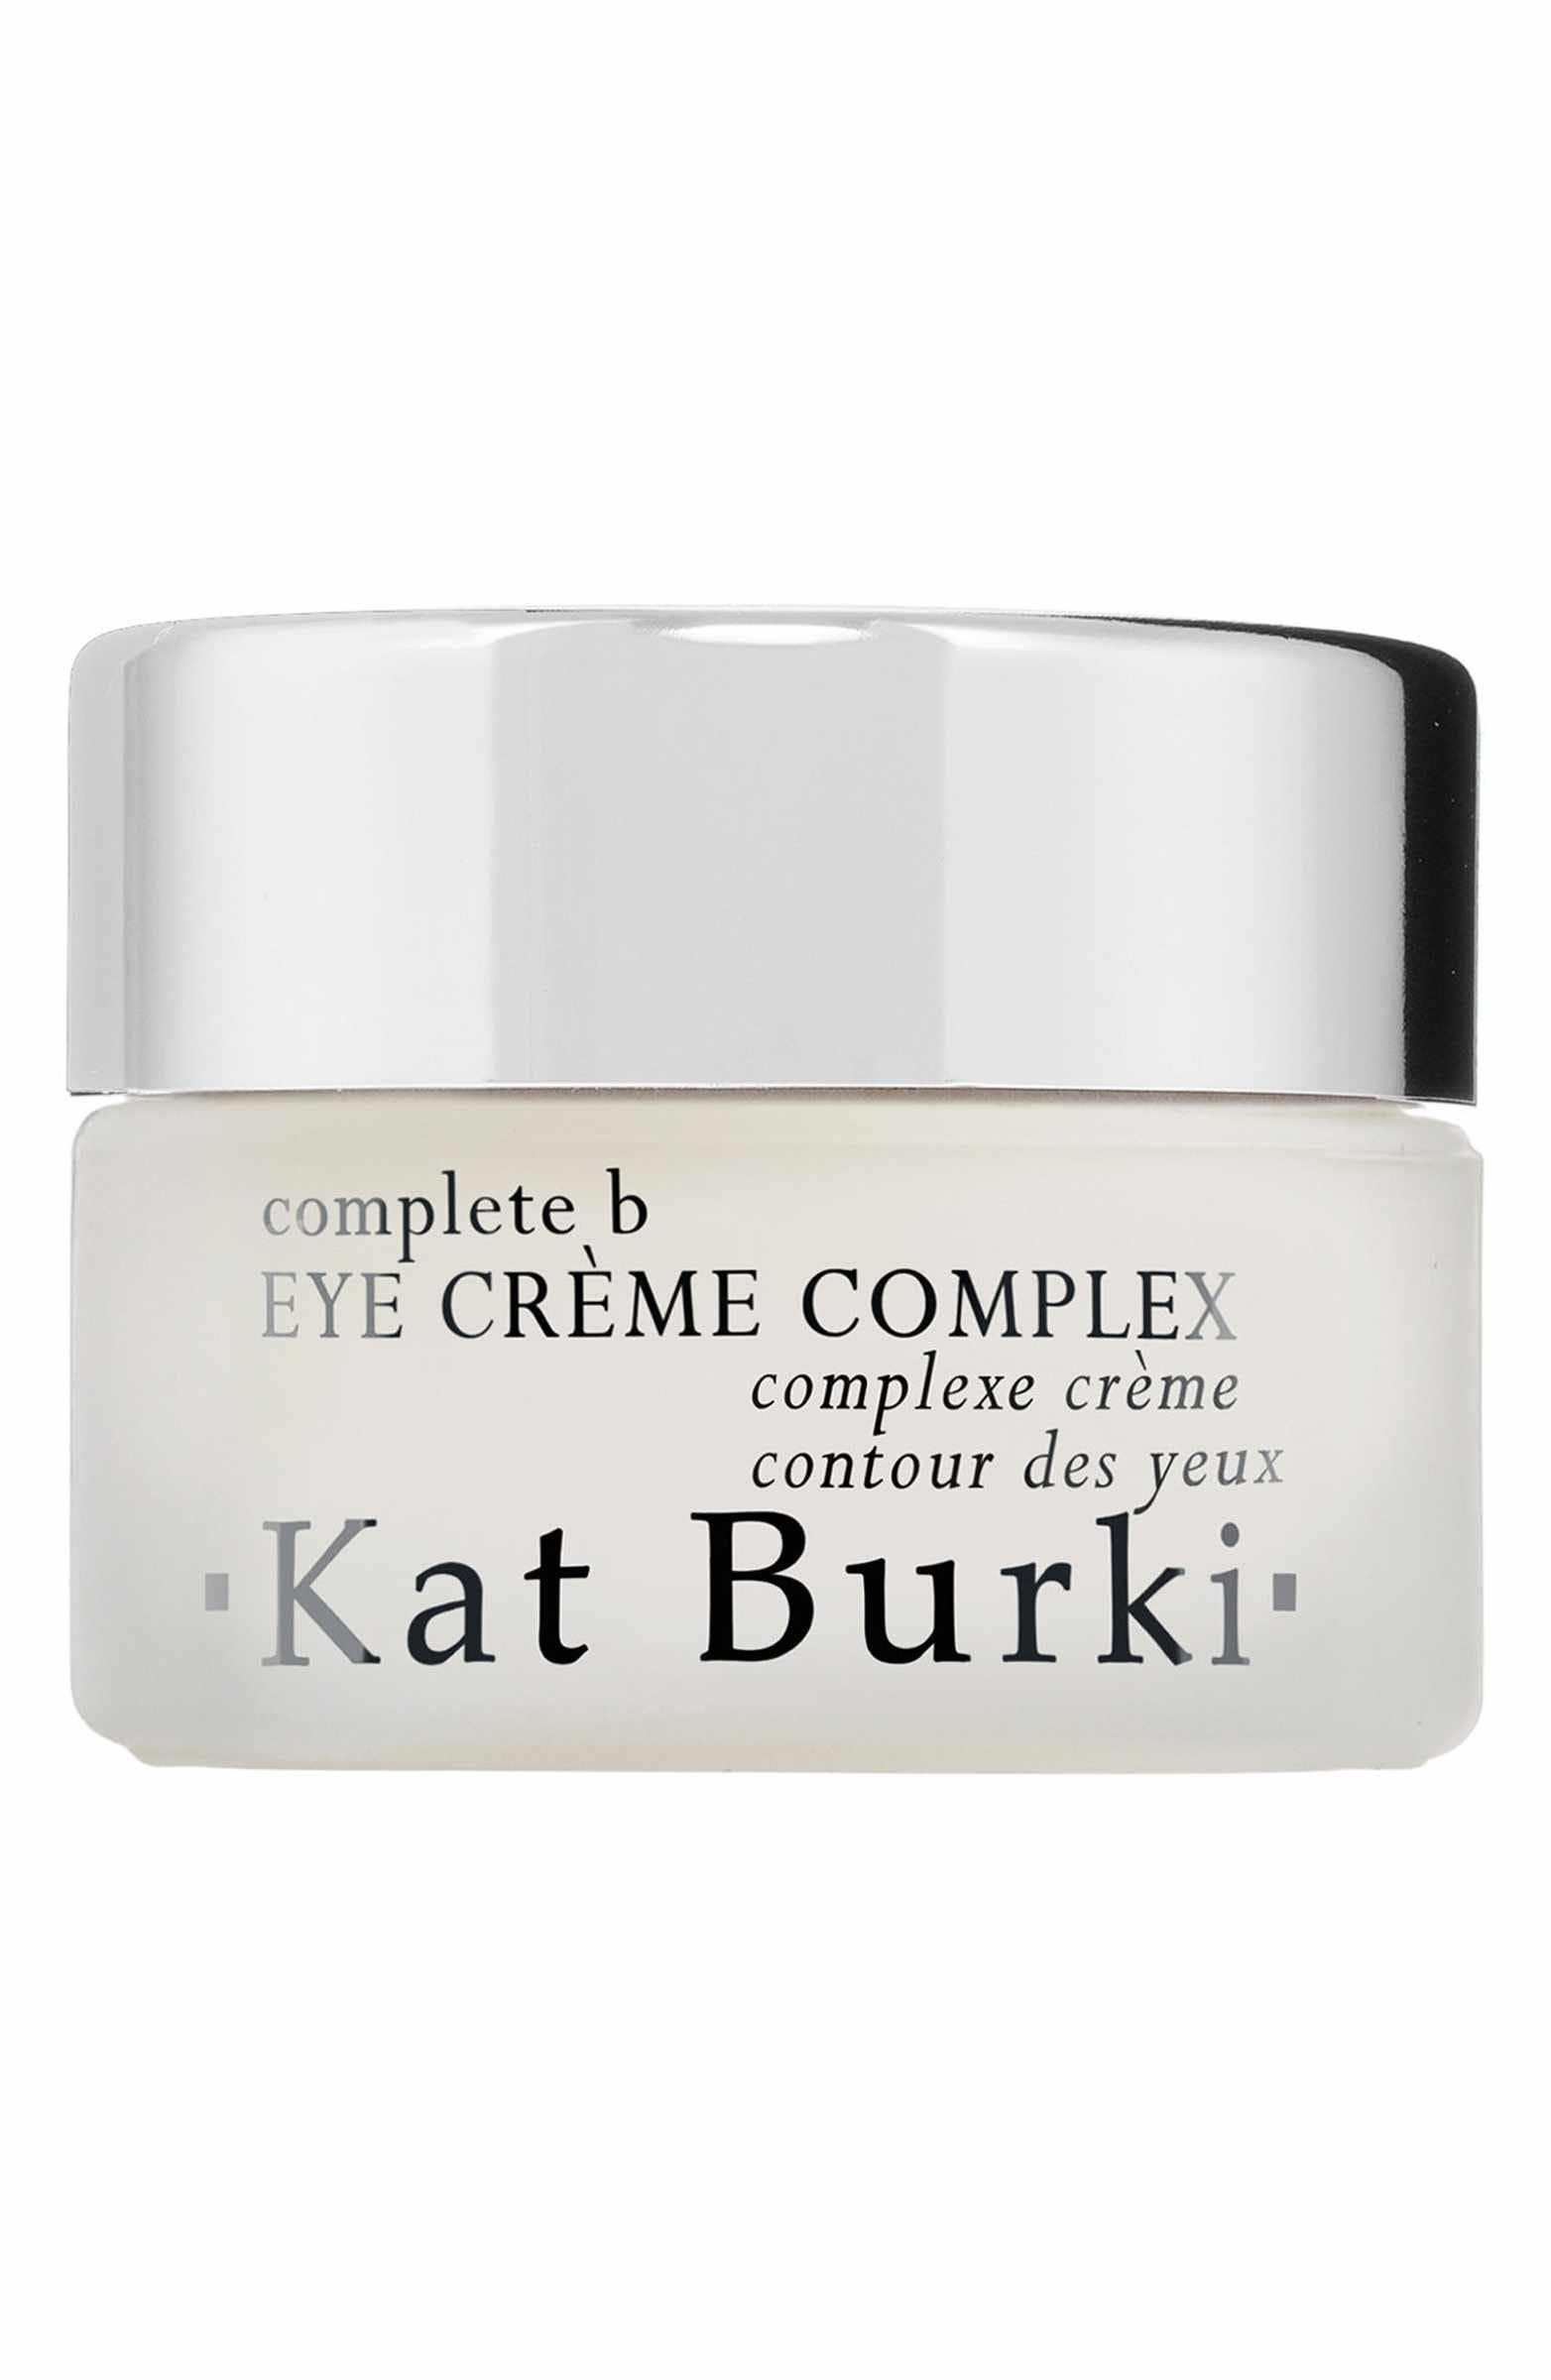 'Complete B' Eye Crème Complex